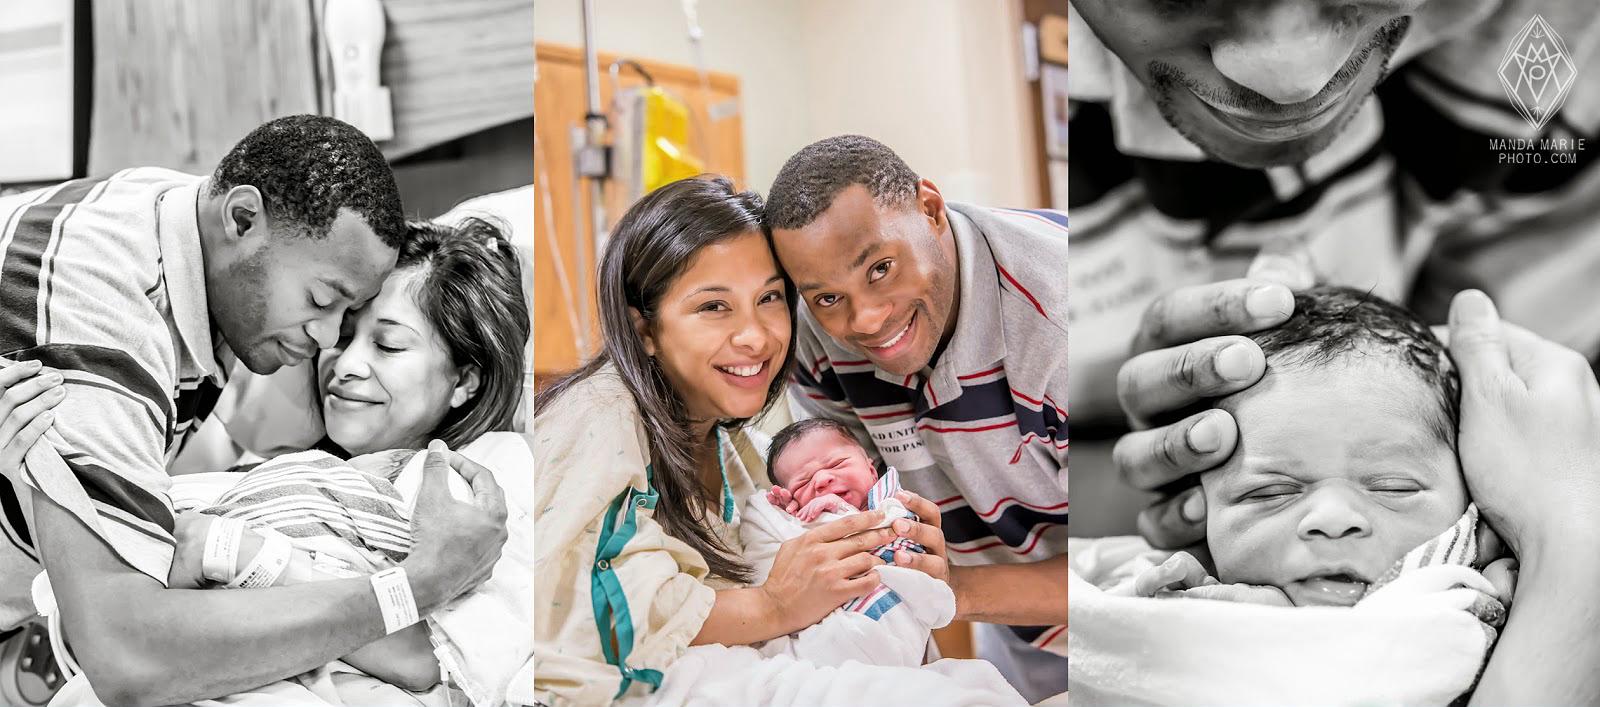 Birth Photography Hospital Portraits